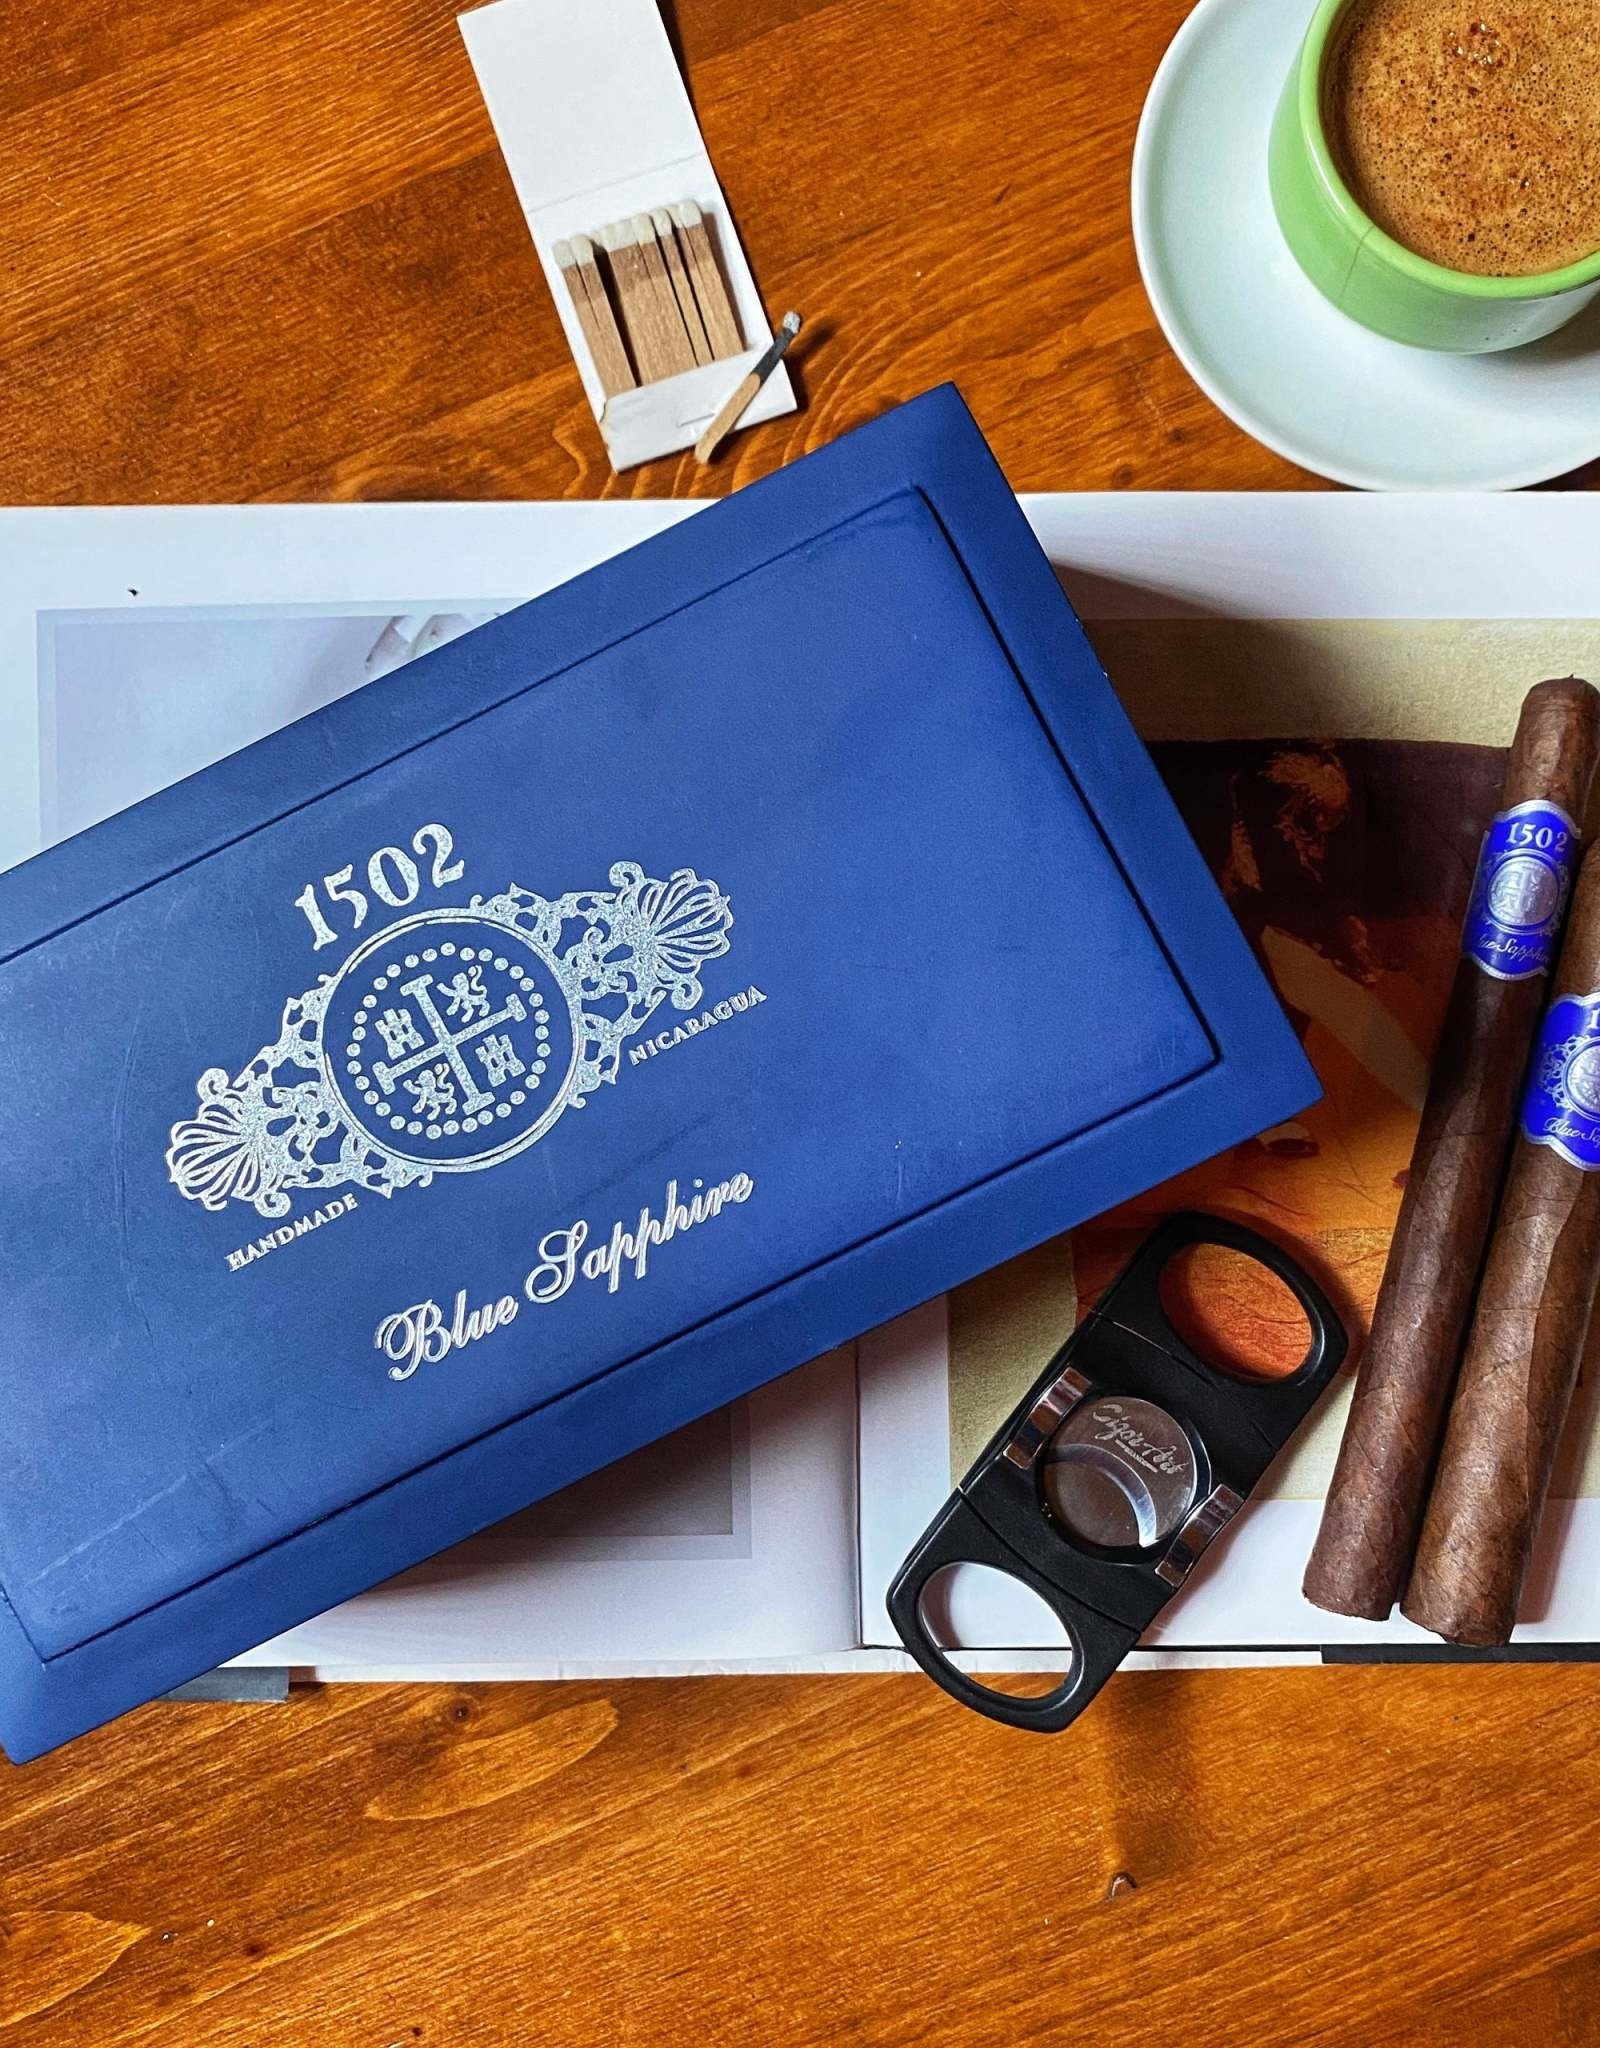 1502 Cigars 1502 Blue Sapphire Lancero 7 x 38